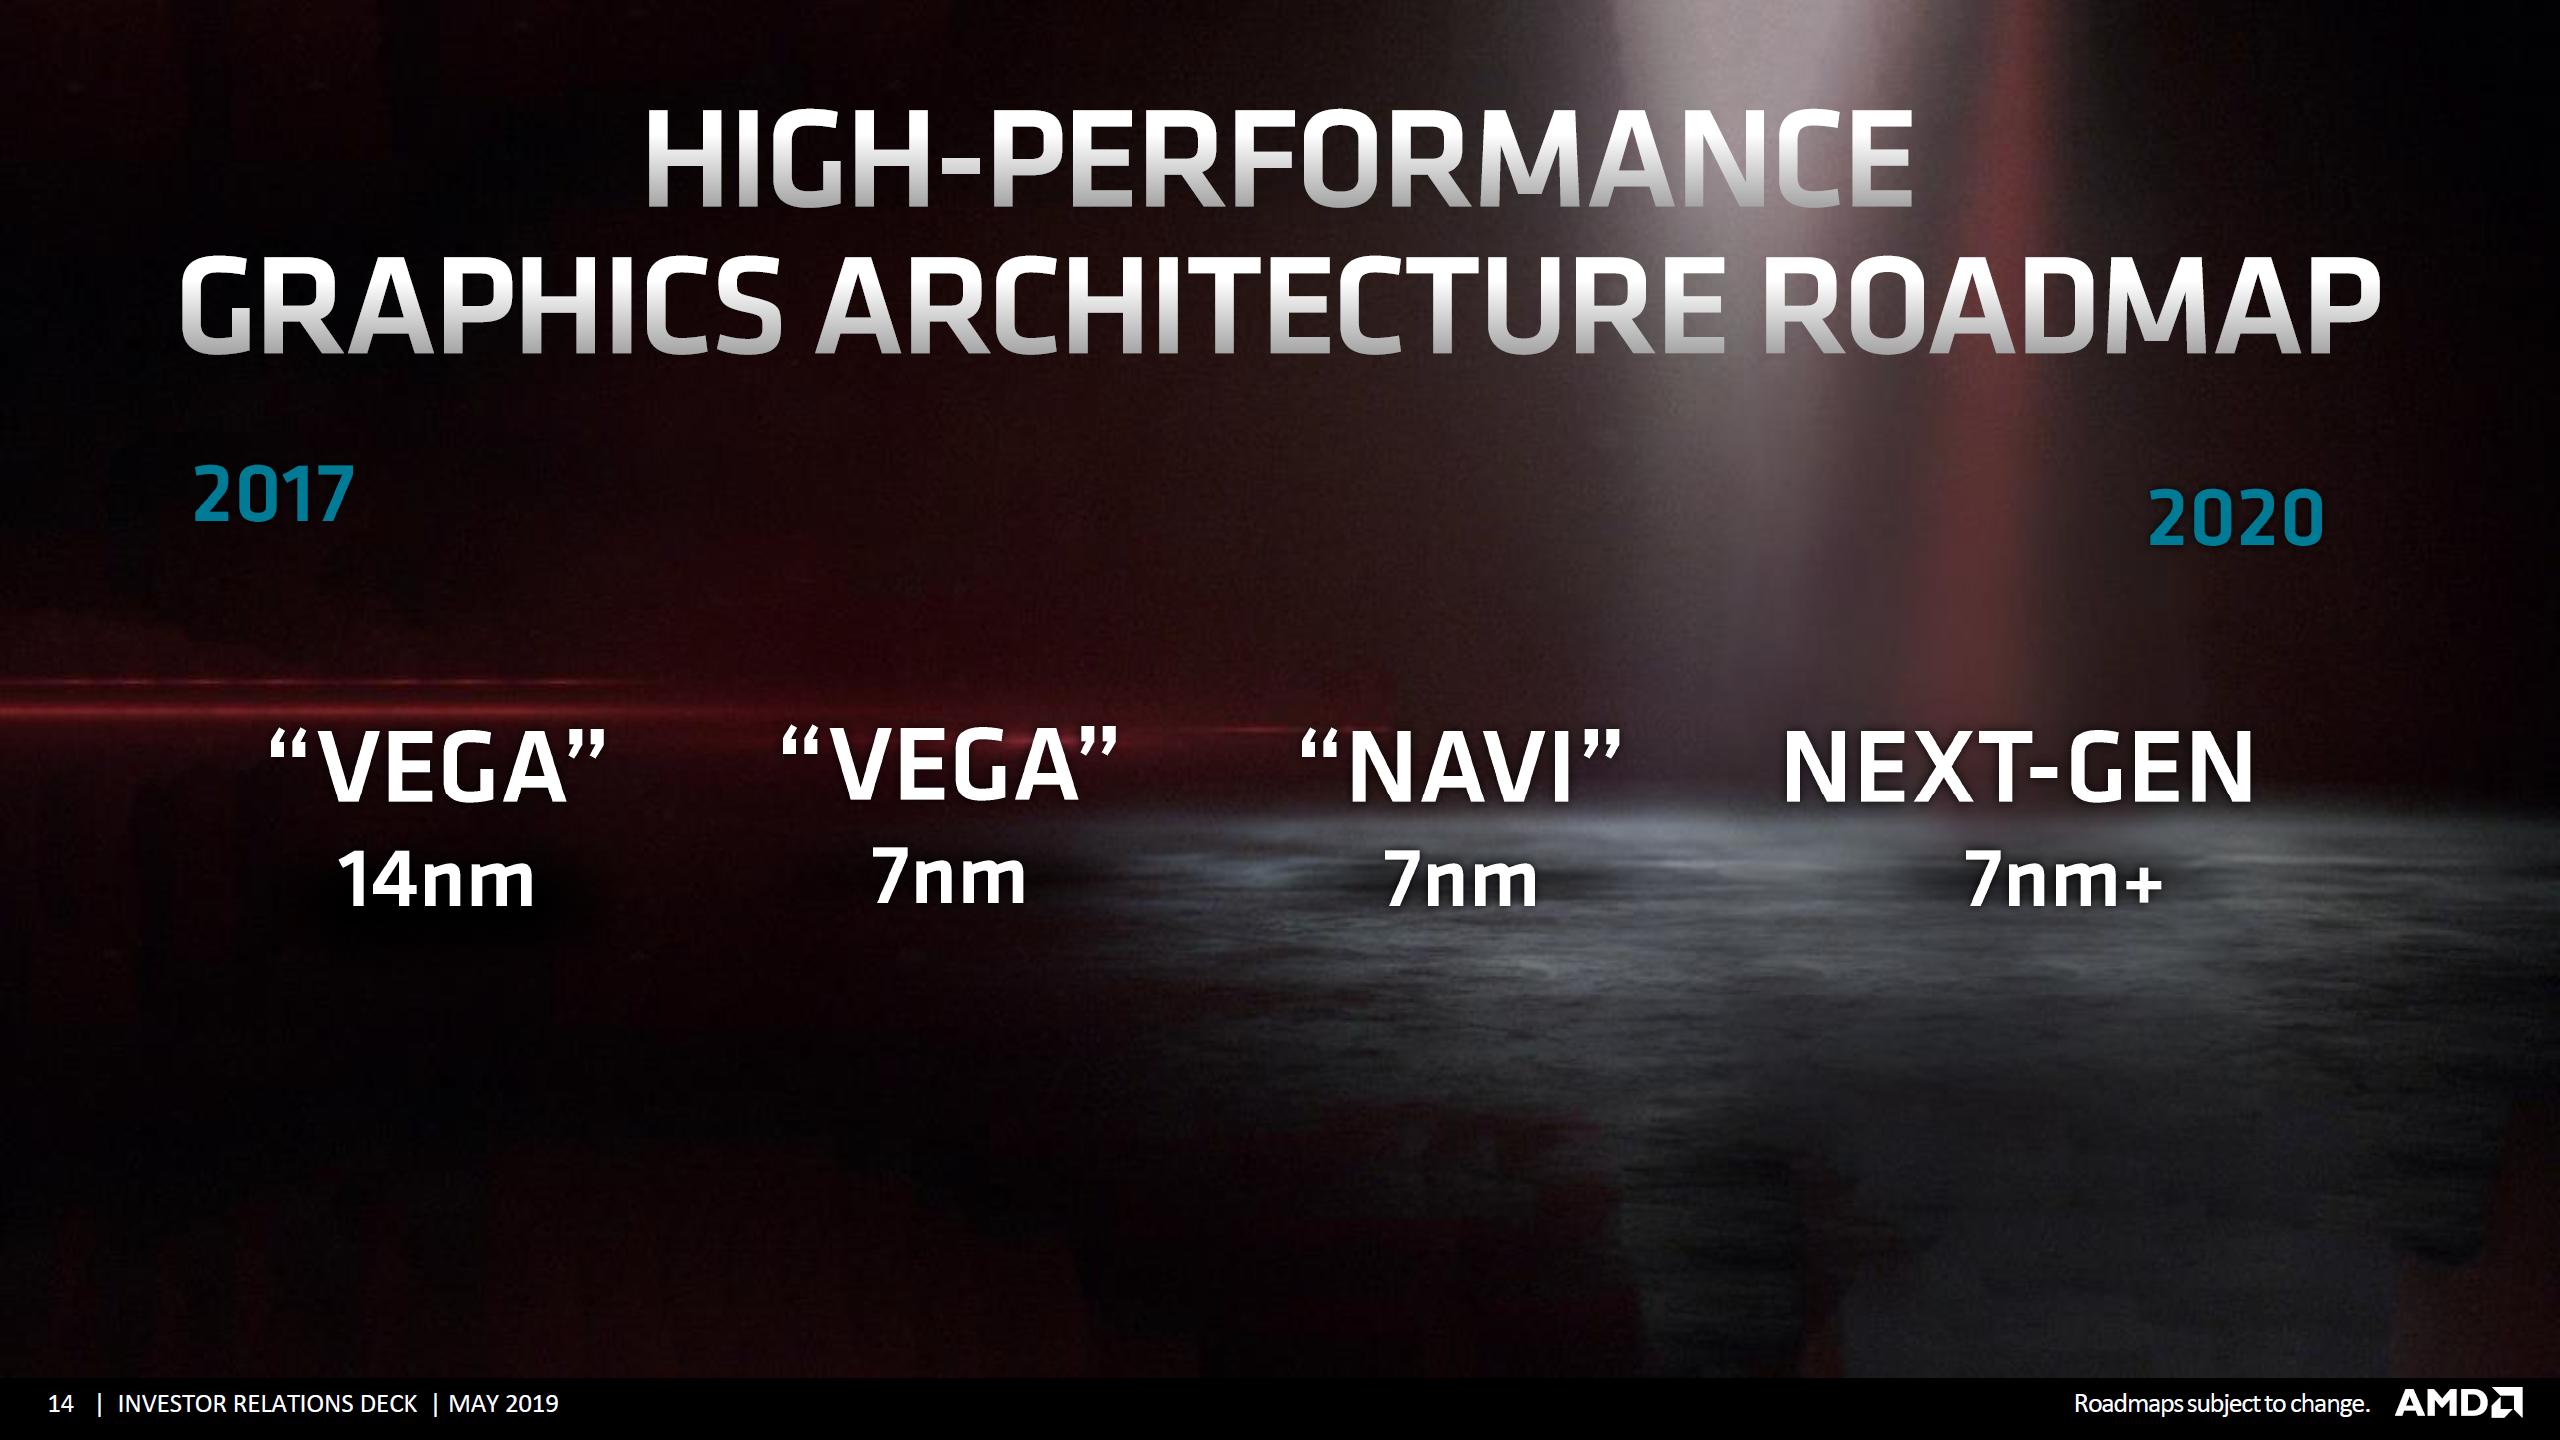 Amd Navi 20 Gpu Delayed Till 2020 7nm Radeon Rx Navi Specs Rumor